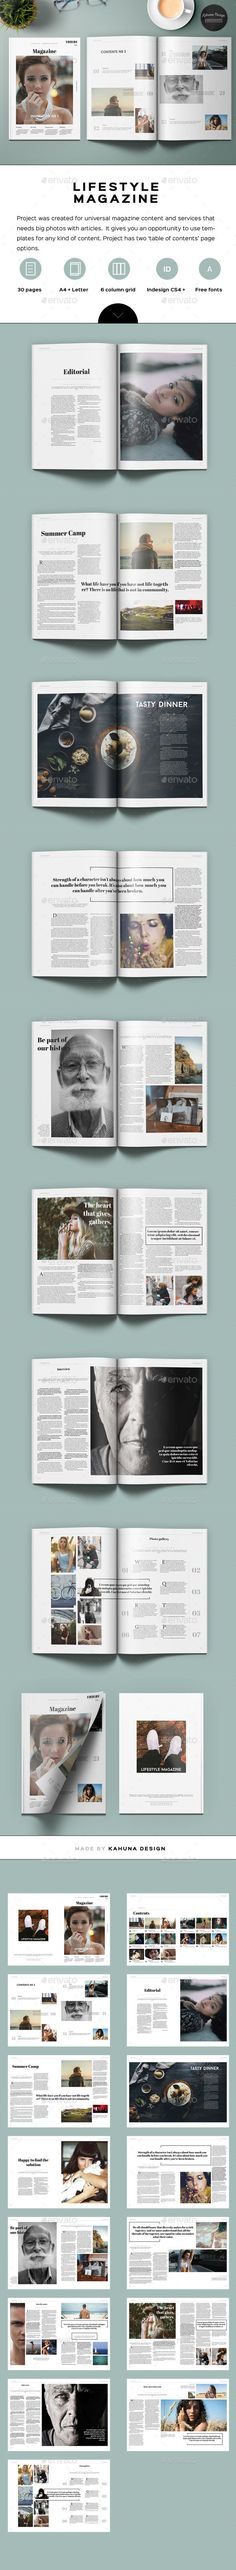 InDesign Magazine Template | Memorable magazines | Pinterest ...